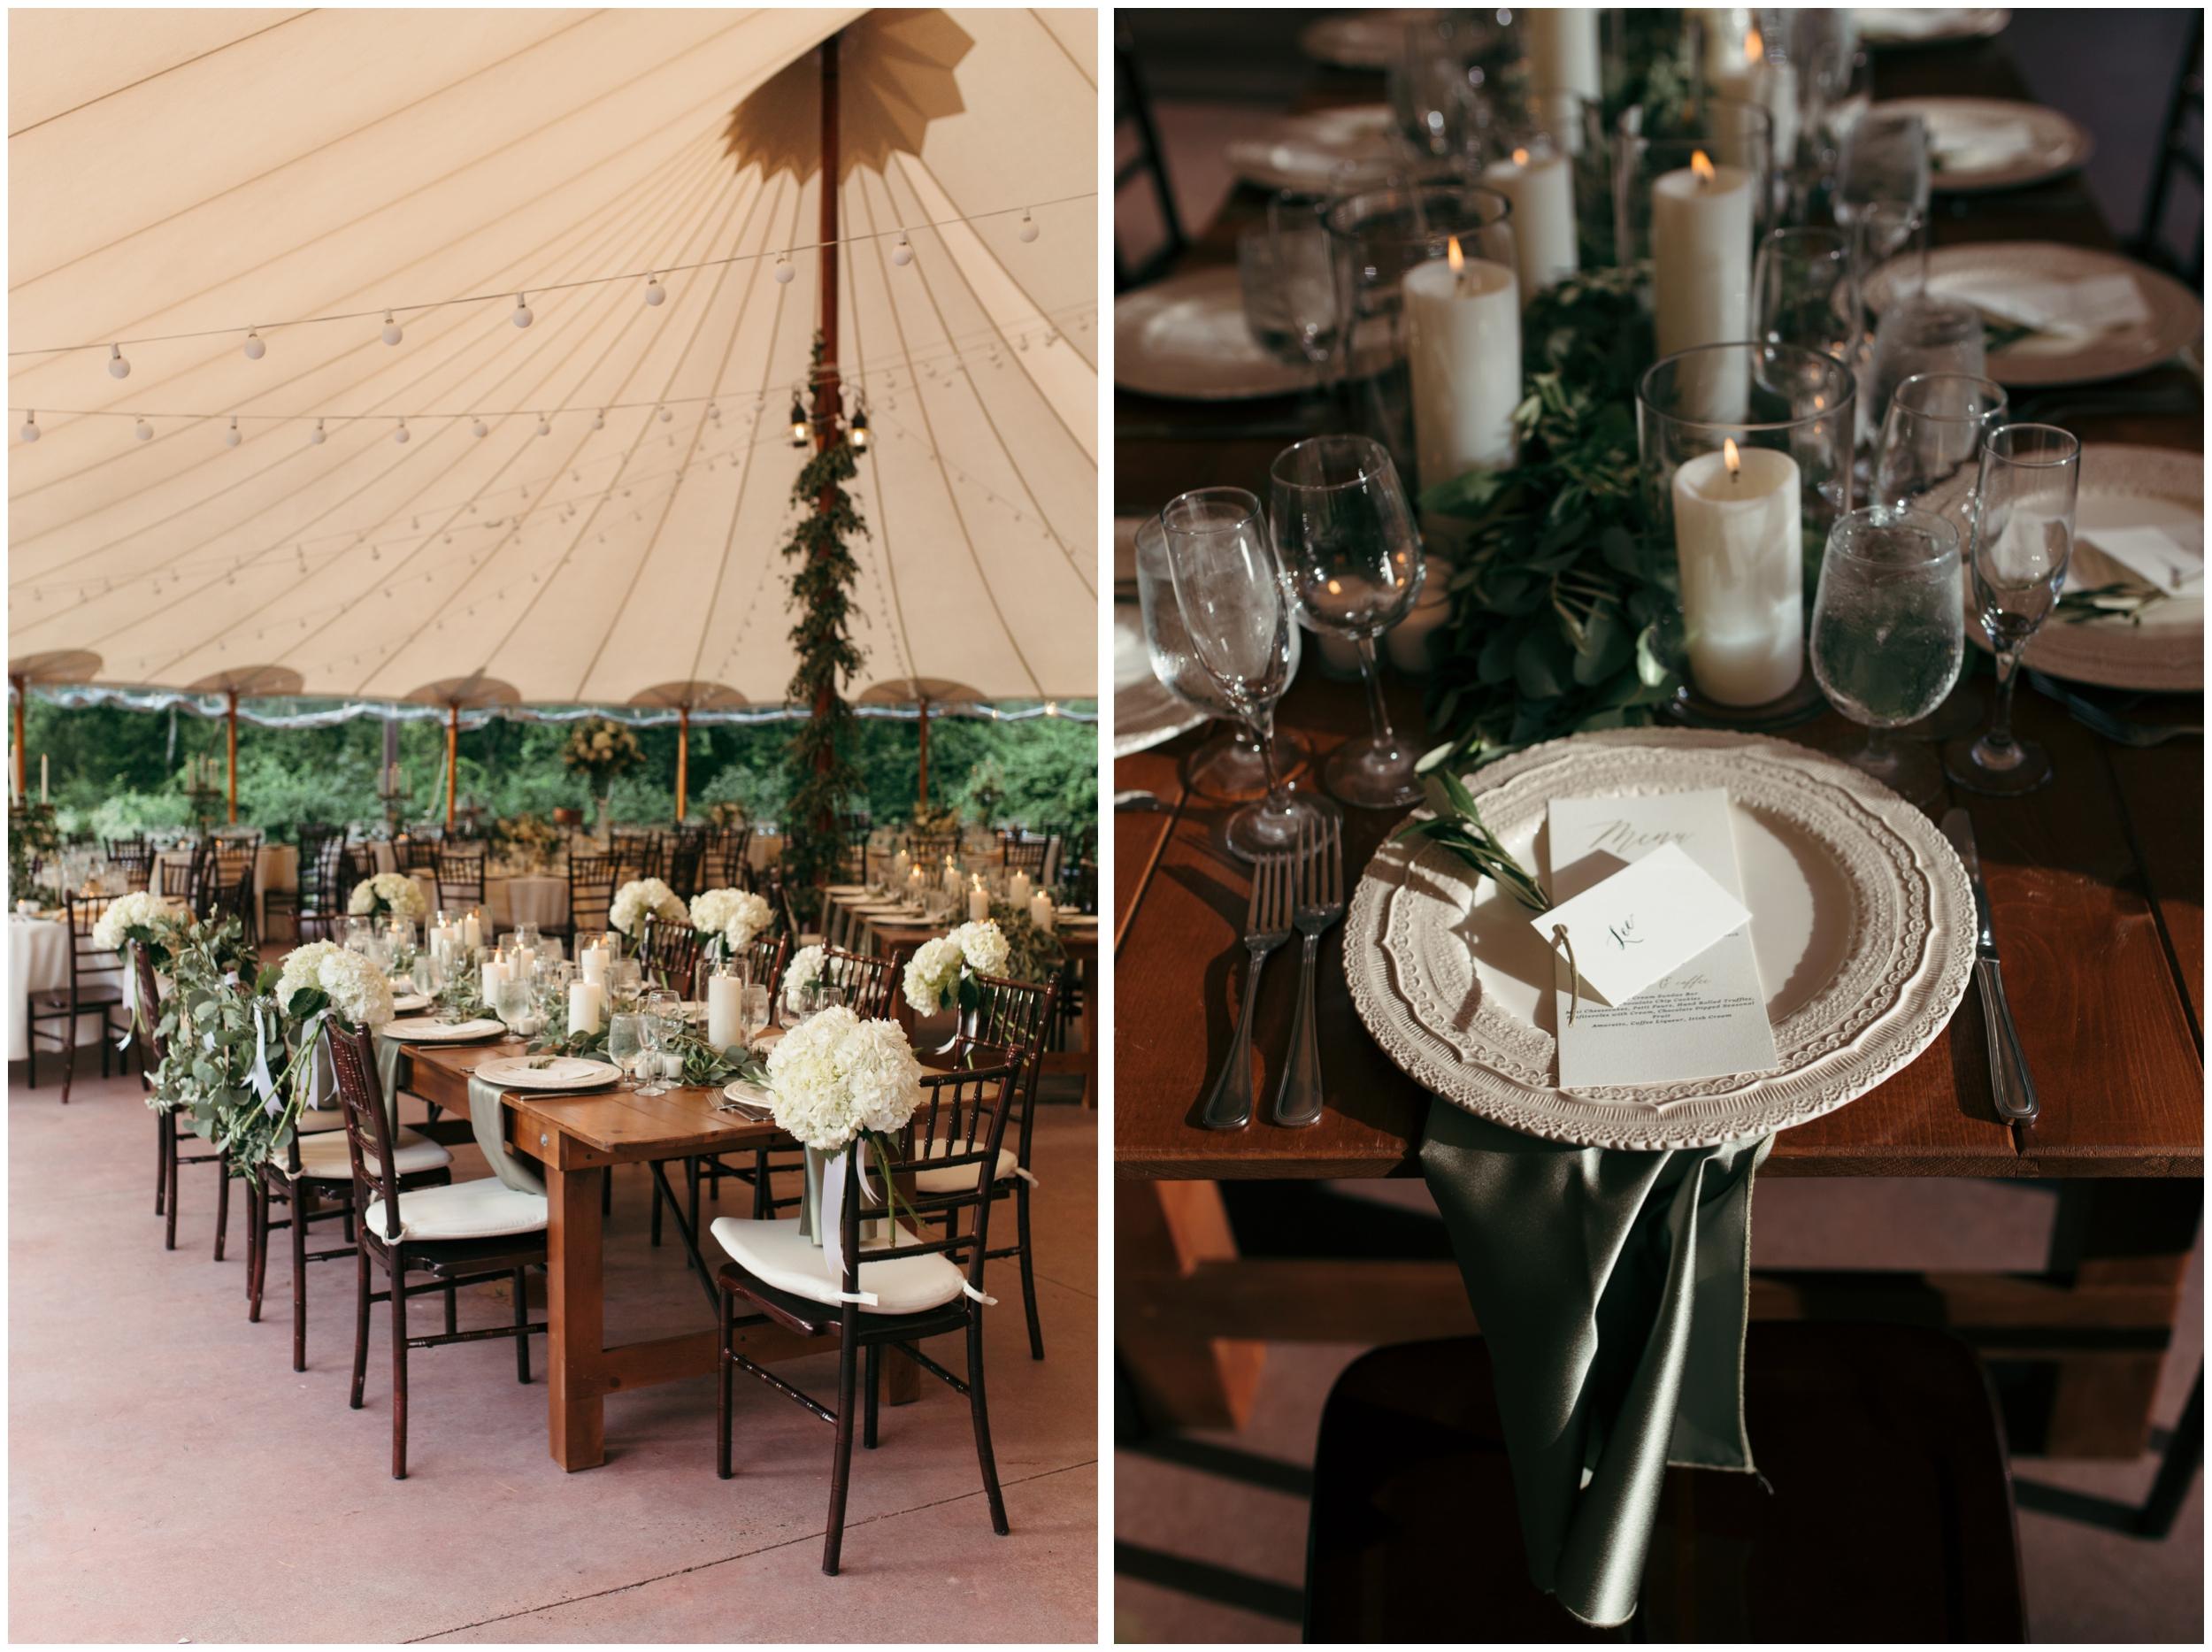 Willowdale-Estate-Wedding-Bailey-Q-Photo-Boston-Wedding-Photographer-071.JPG